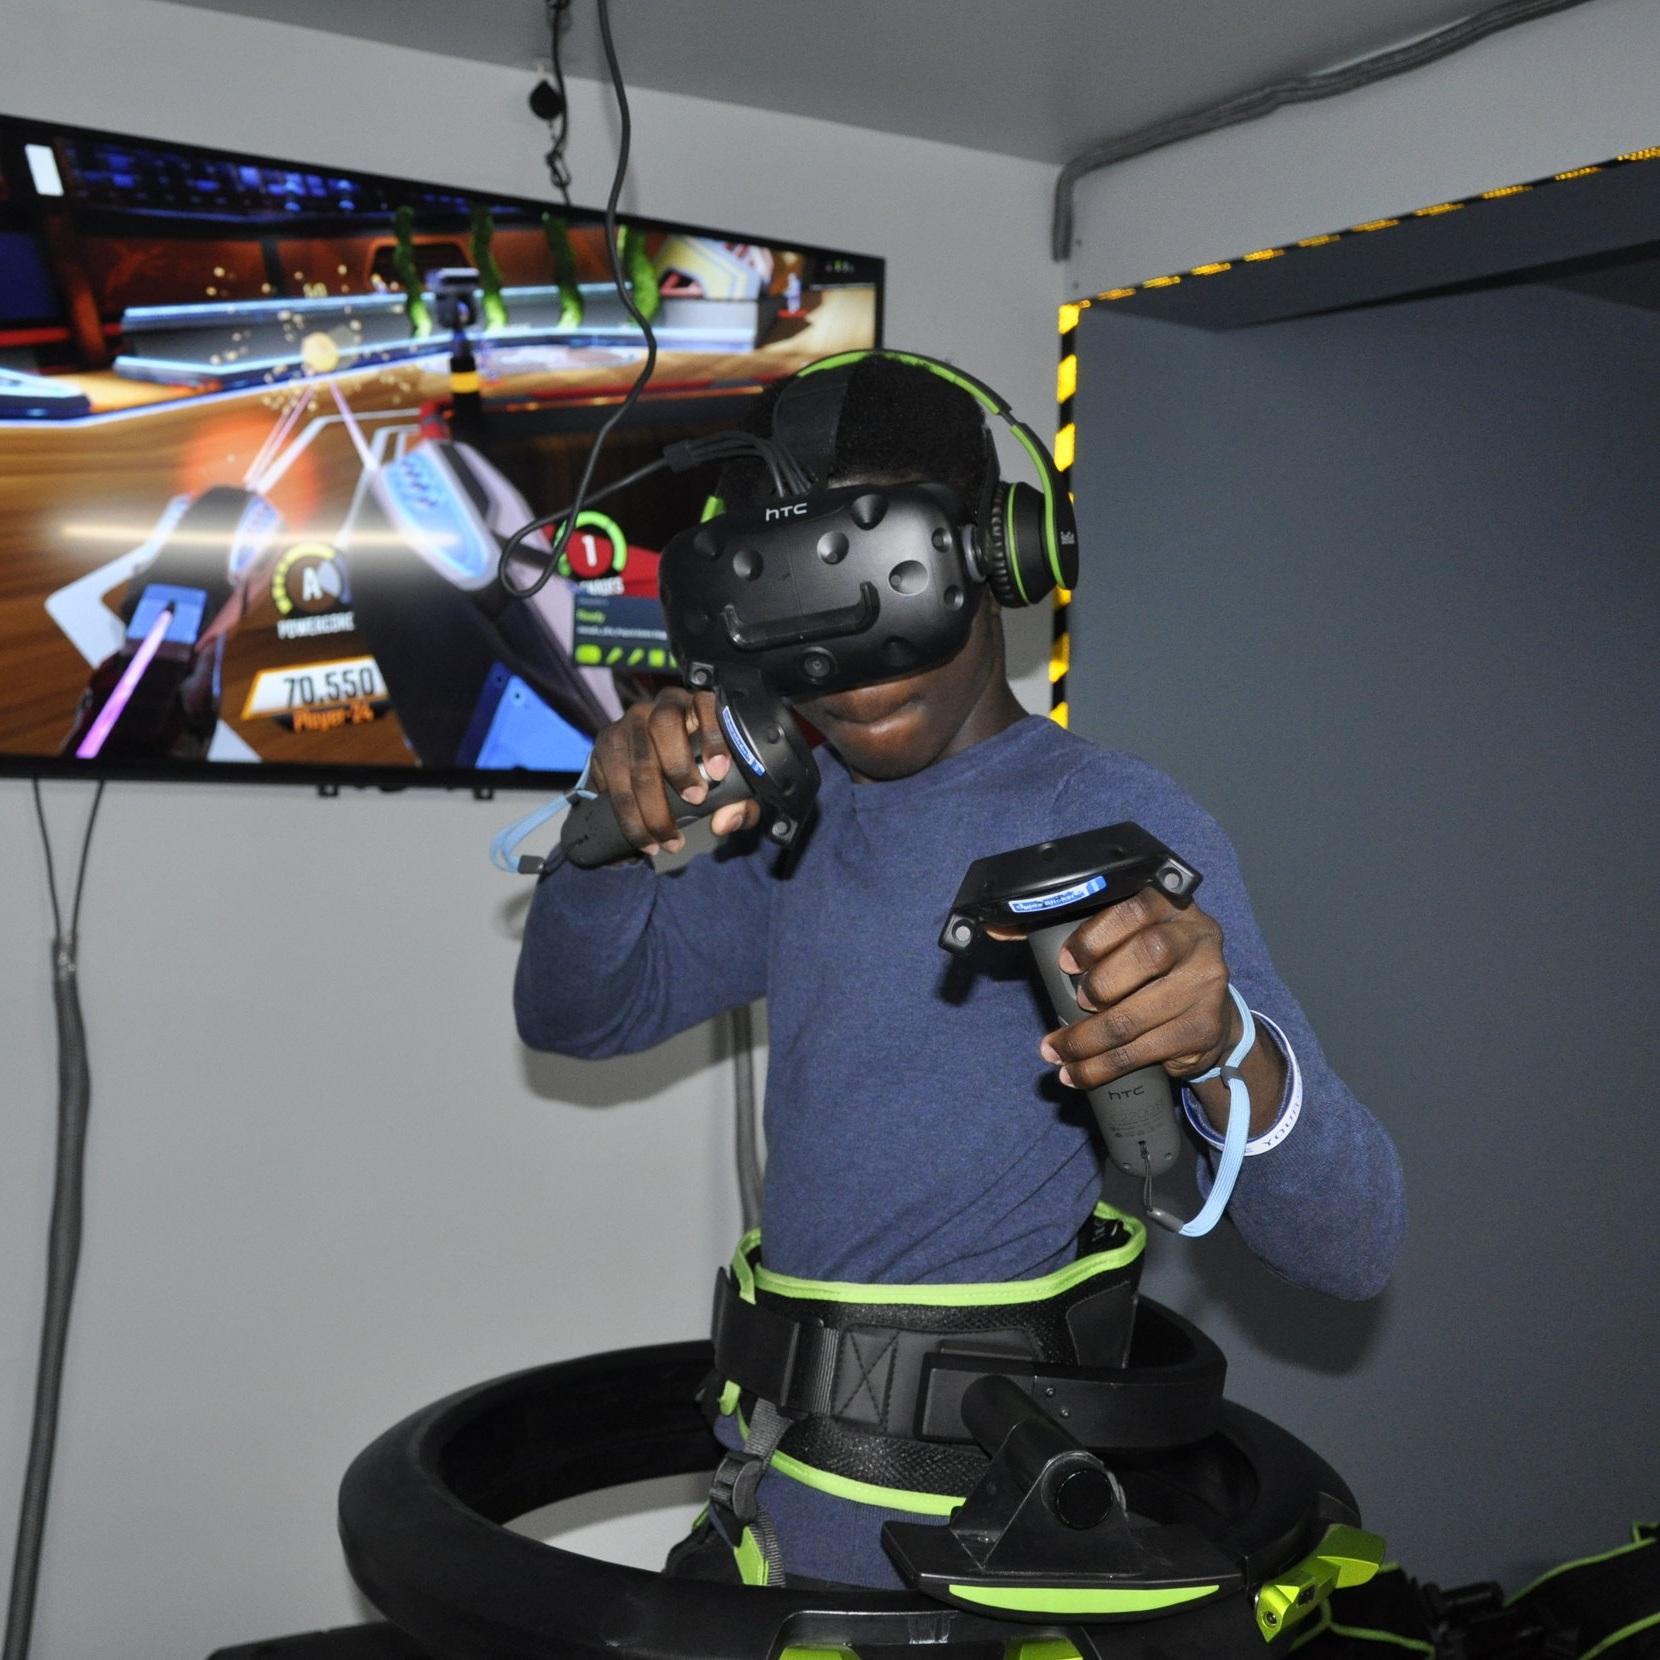 VR Lab Kids Event Flight Simulator